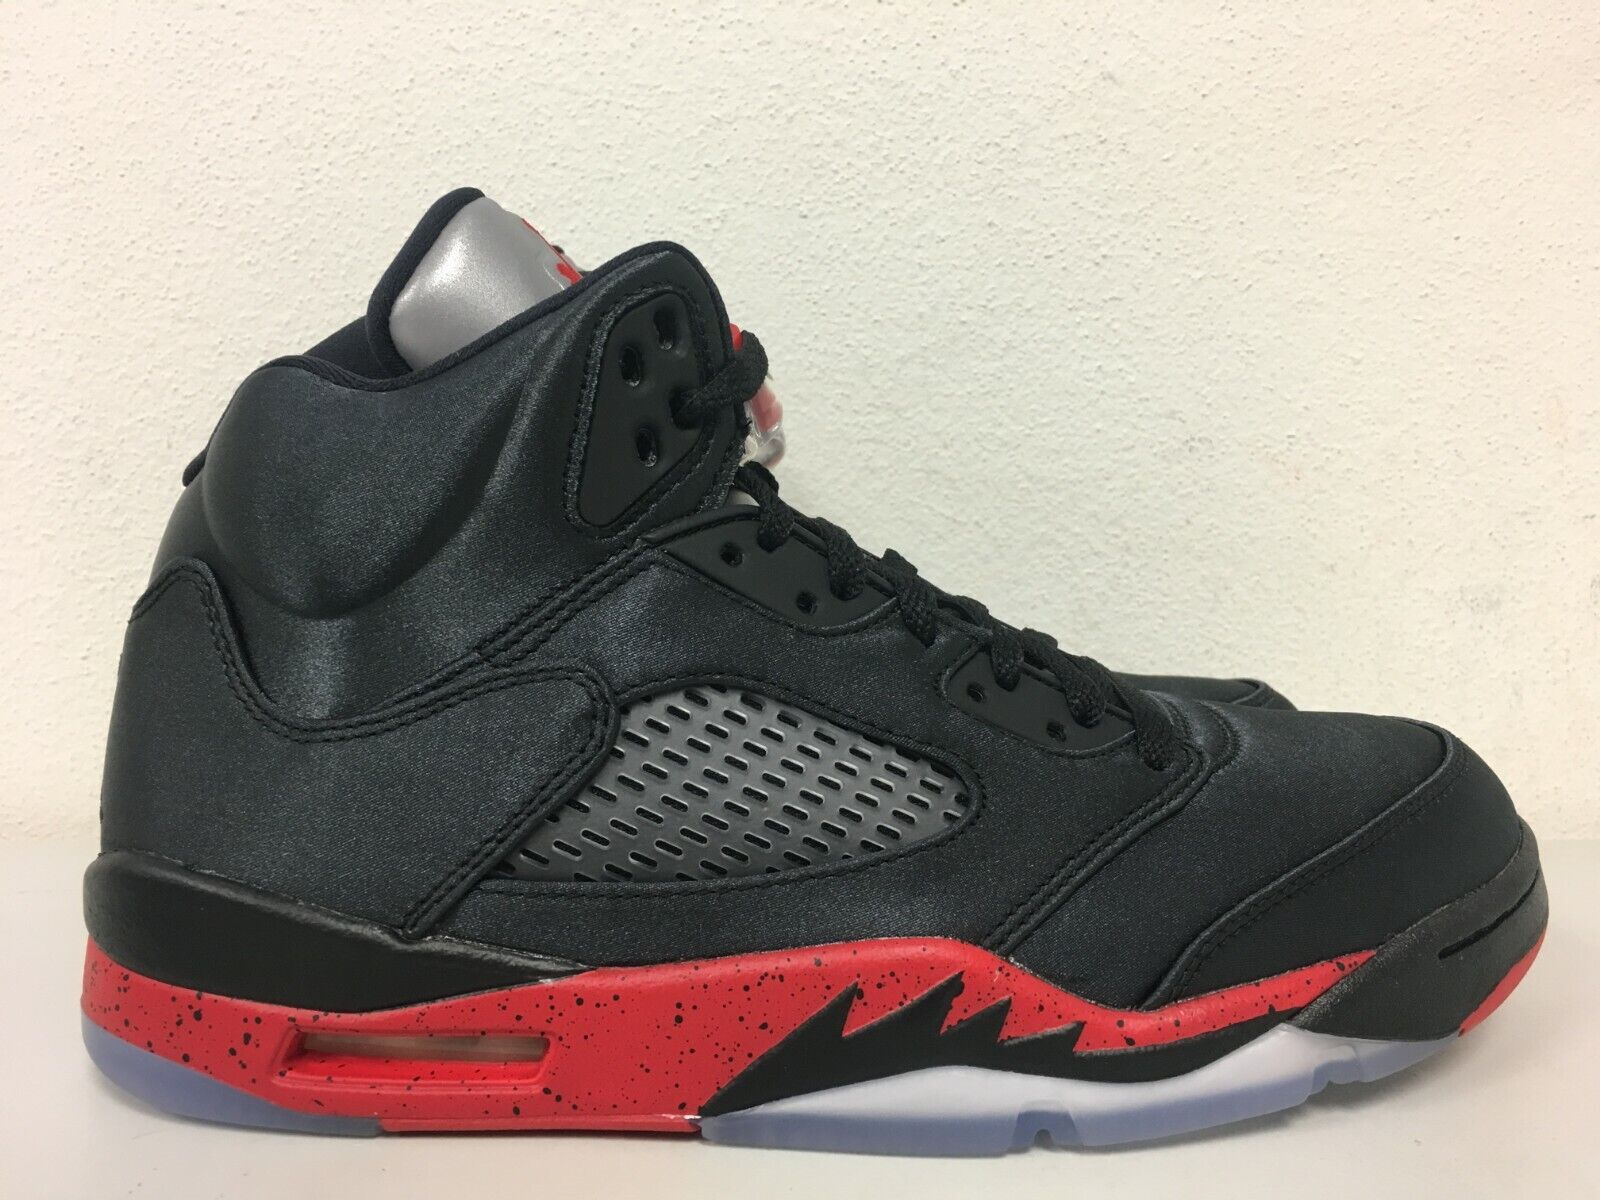 Nike Air Jordan 5 Retro Satin Bred Black Red 136027 006 Mens Size 8.5